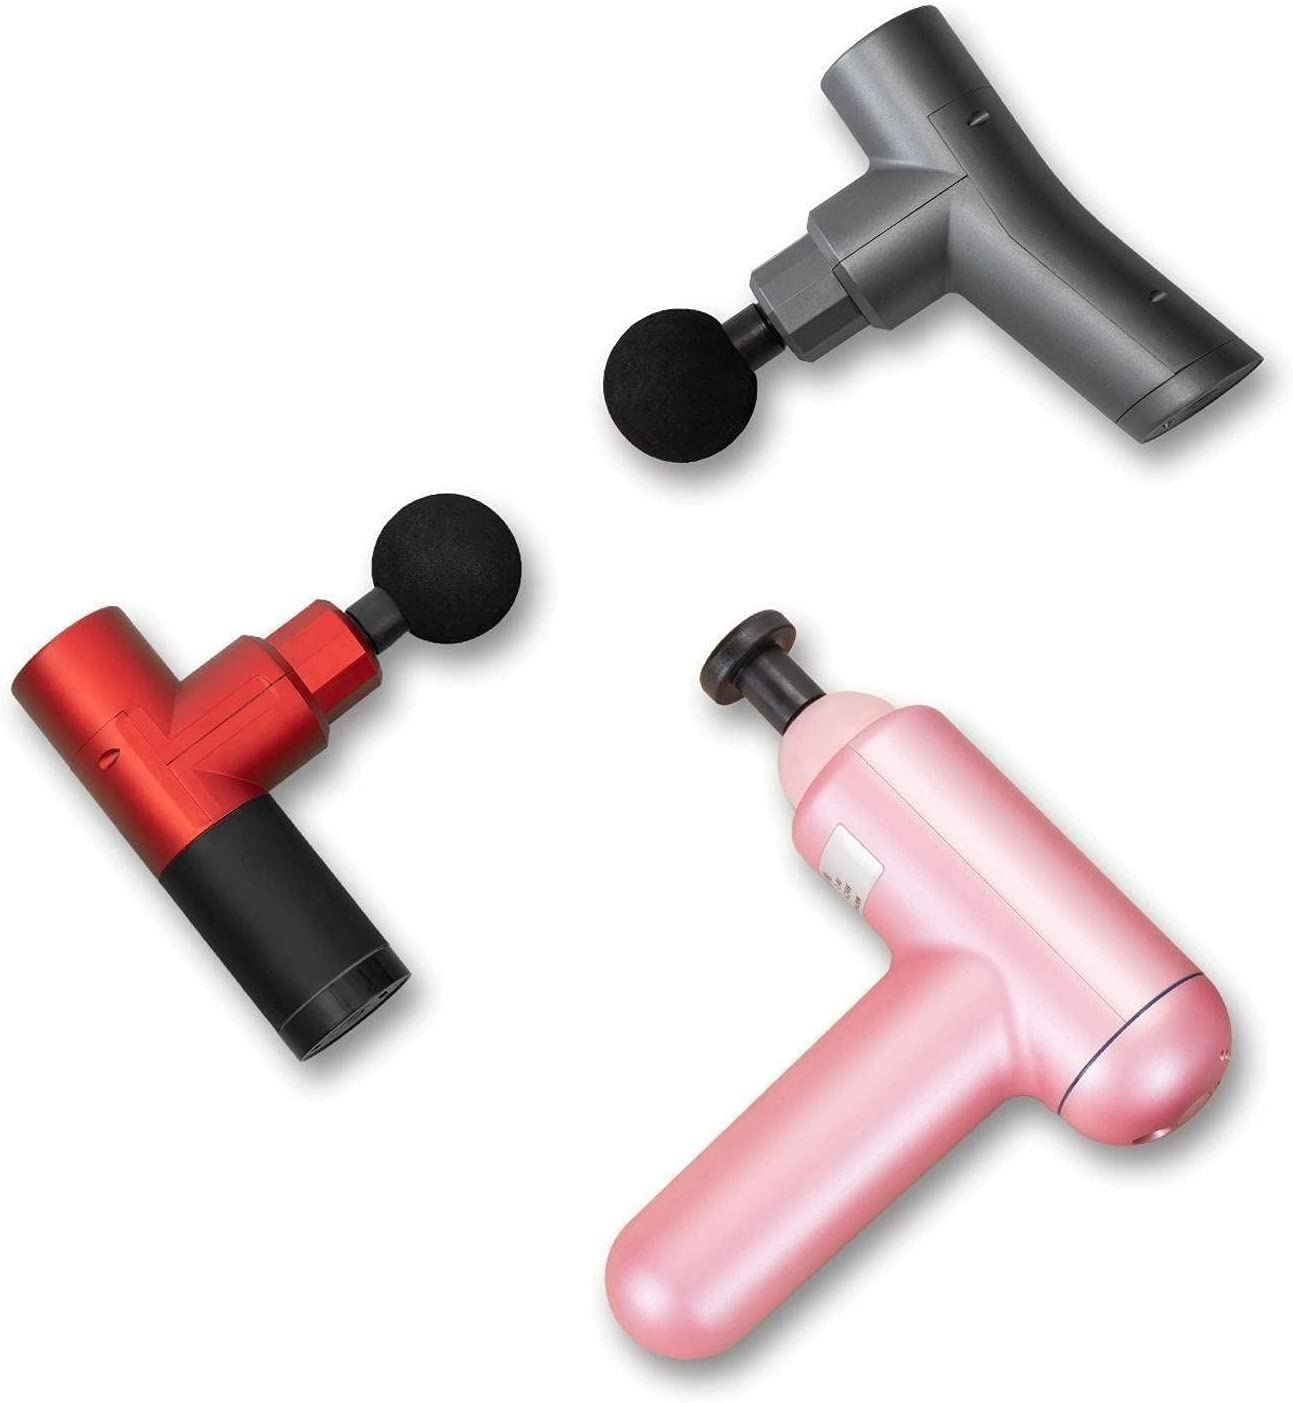 Mini Fascia Gun Electric Muscle low-pricing Pocket Tulsa Mall Massager Massage